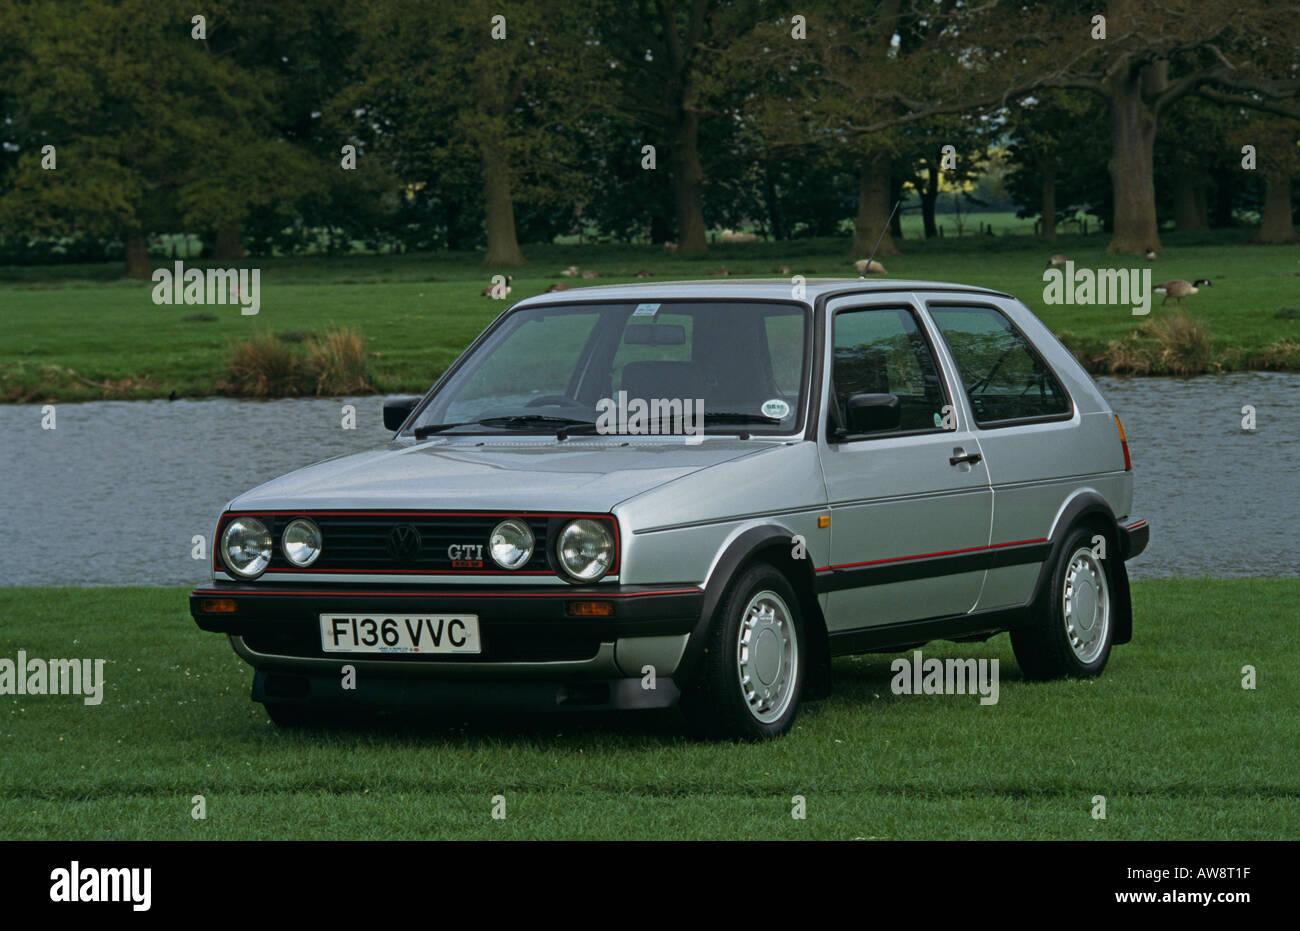 hight resolution of volkswagen golf mk2 gti 16v 1984 to 1992